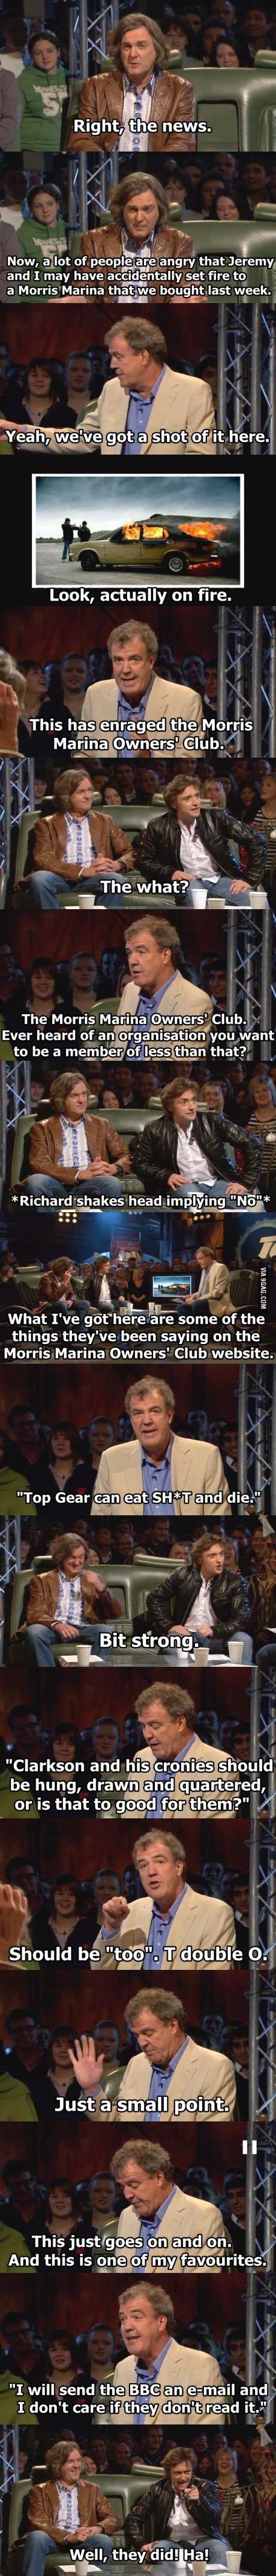 One of my favorite Top Gear scenes.